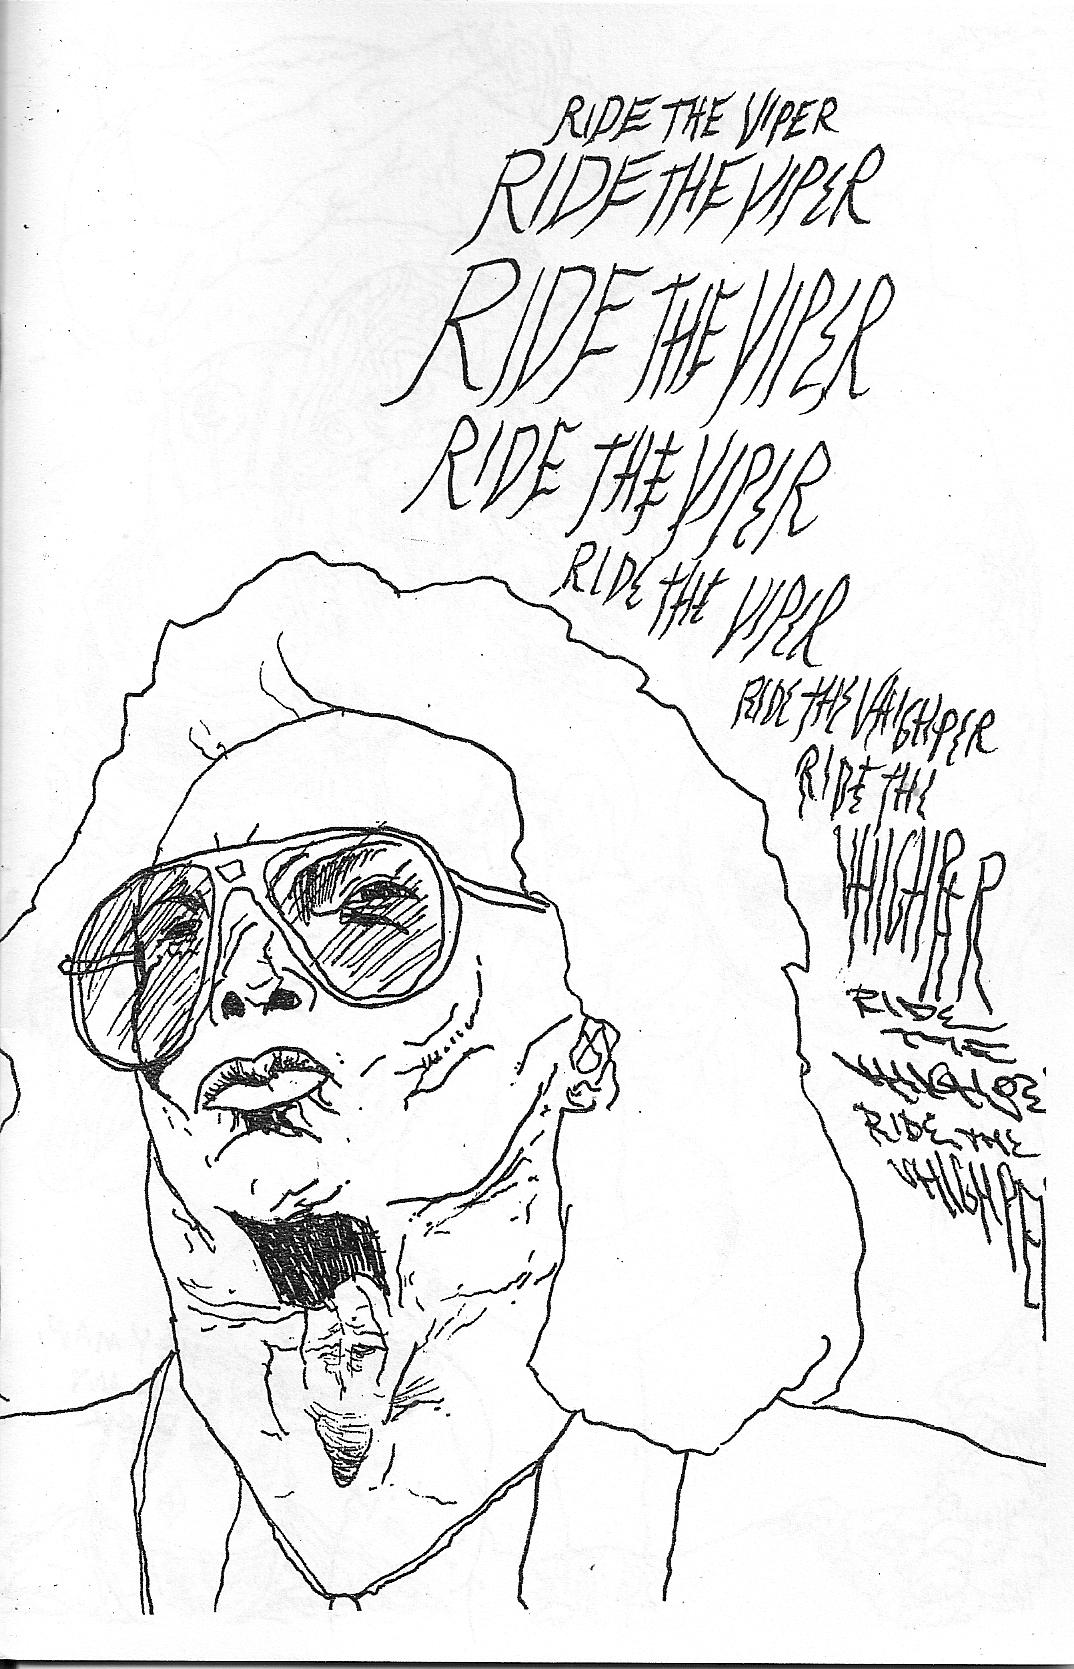 Ride The Viper zine Dan Rossiter